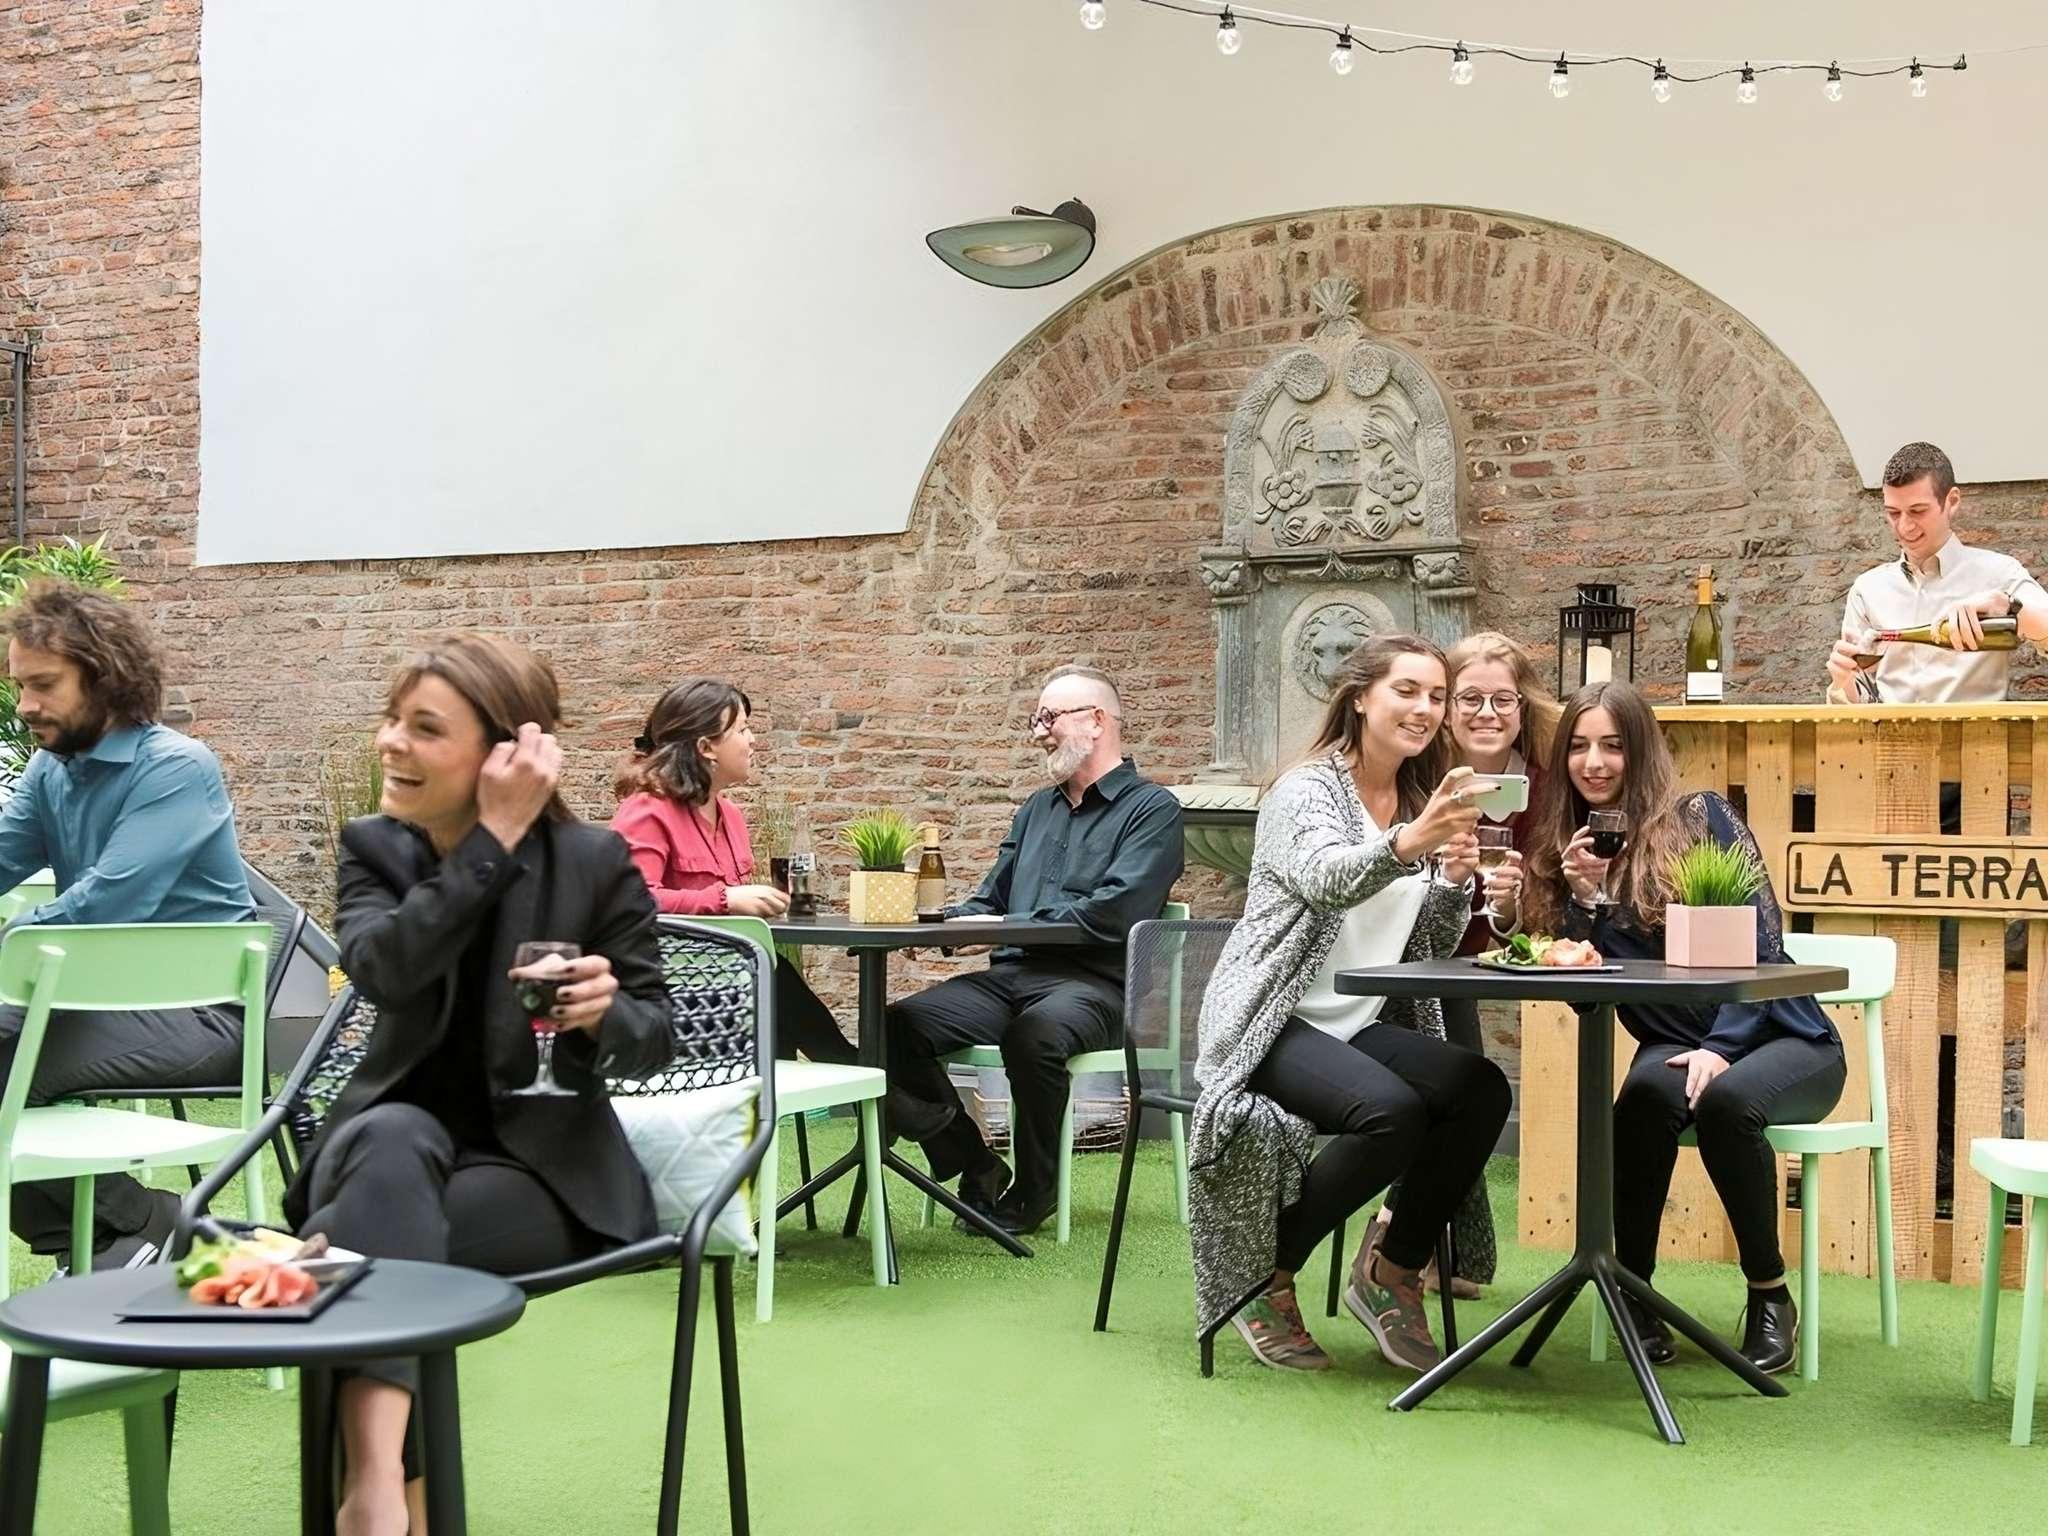 Hotell – Mercure Lille Centre Vieux Lille